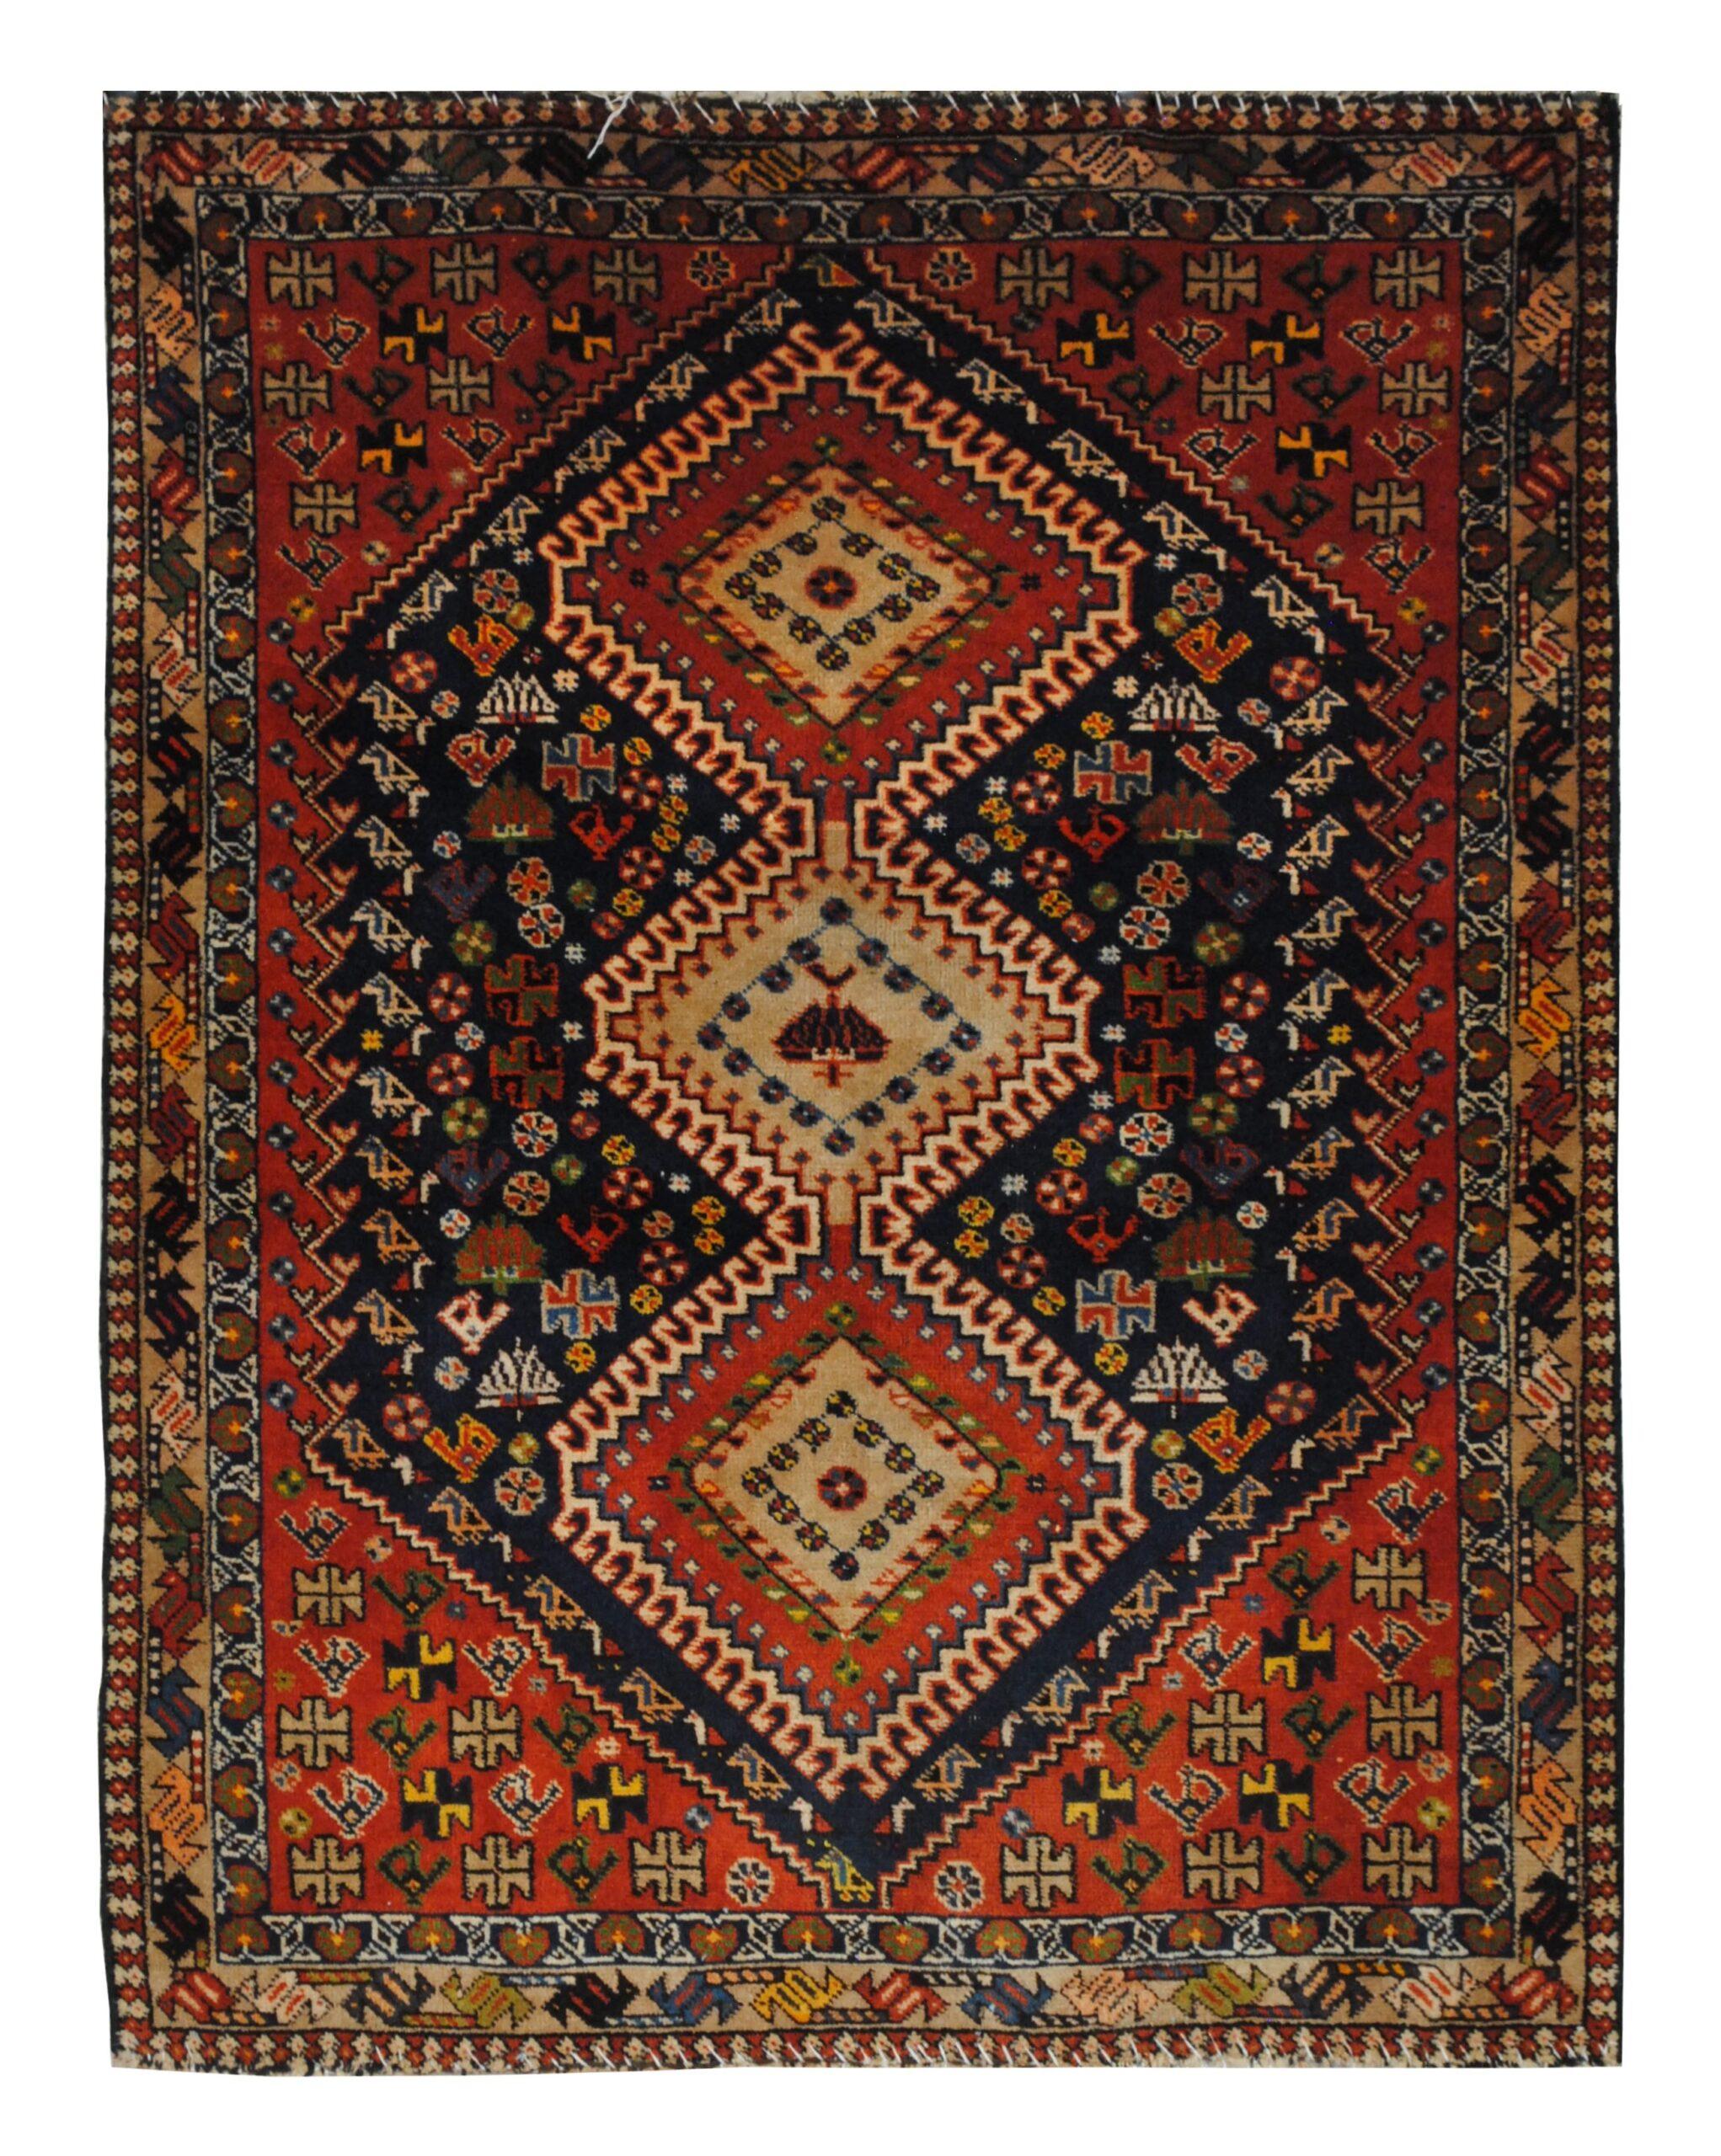 "Persian Yallameh 3' 7"" x 4' 8"" Handmade Area Rug - Shabahang Royal Carpet"